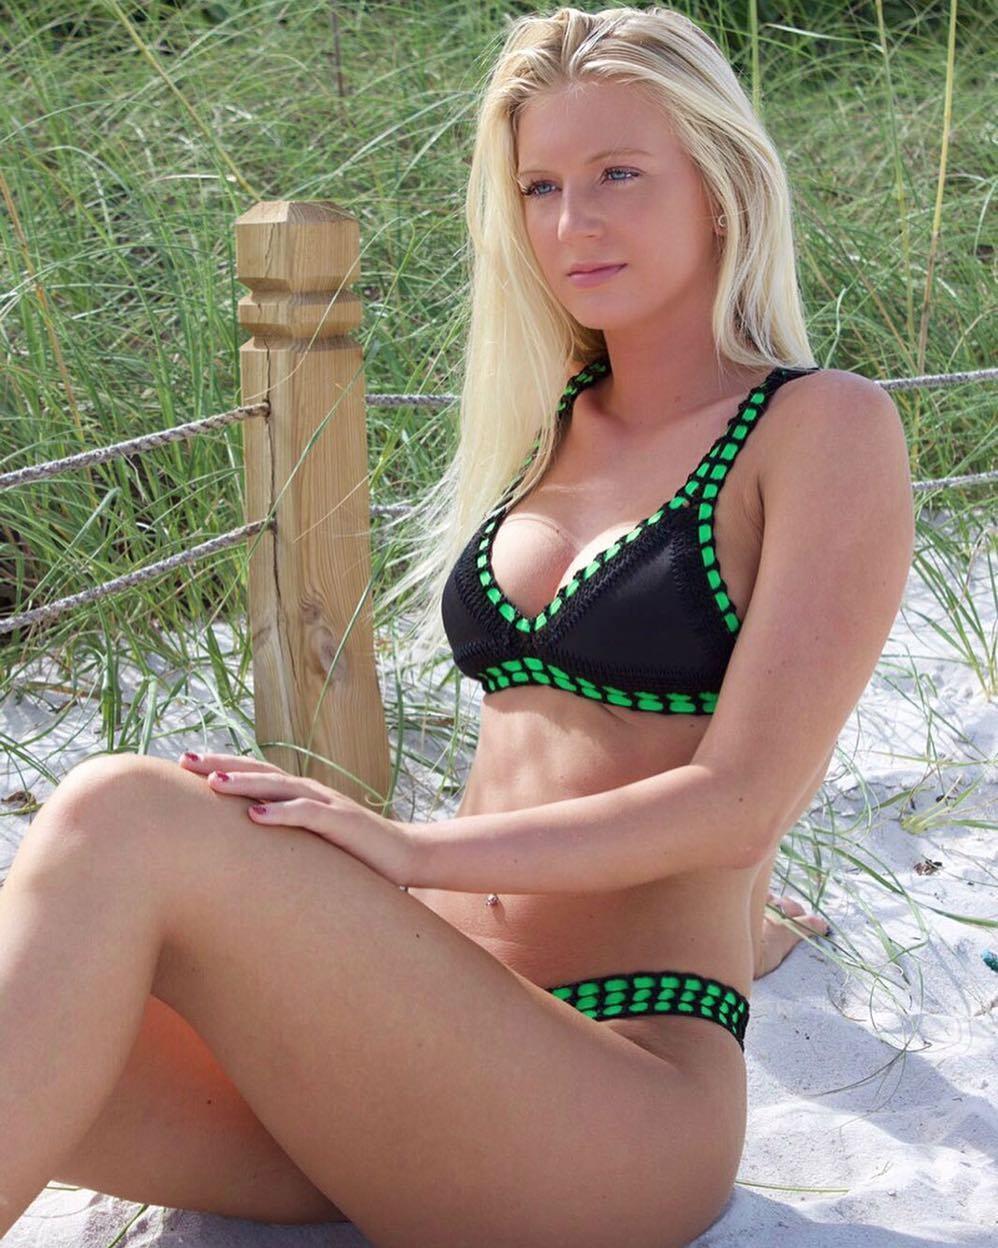 cute girls handjobs and blowjobs busty blonde giving #Alexis #bikini #blonde #perfectbody